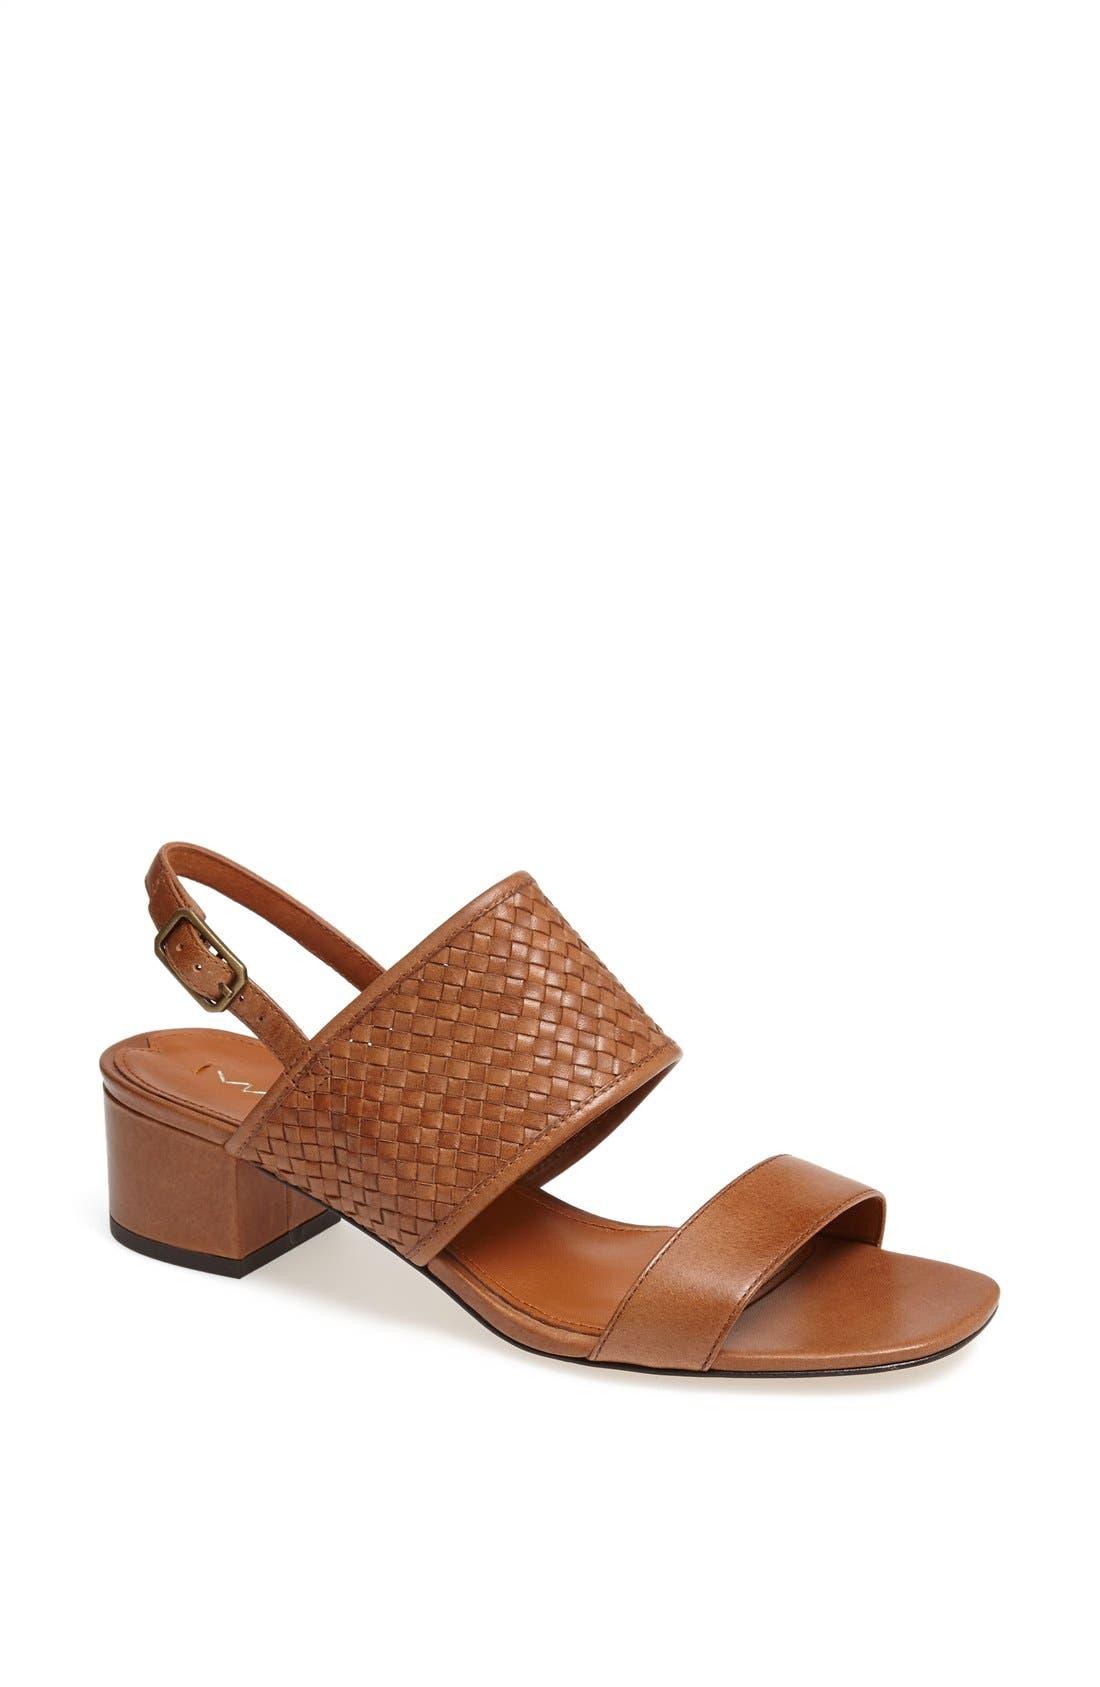 Alternate Image 1 Selected - Via Spiga 'Cairo2' Leather Sandal